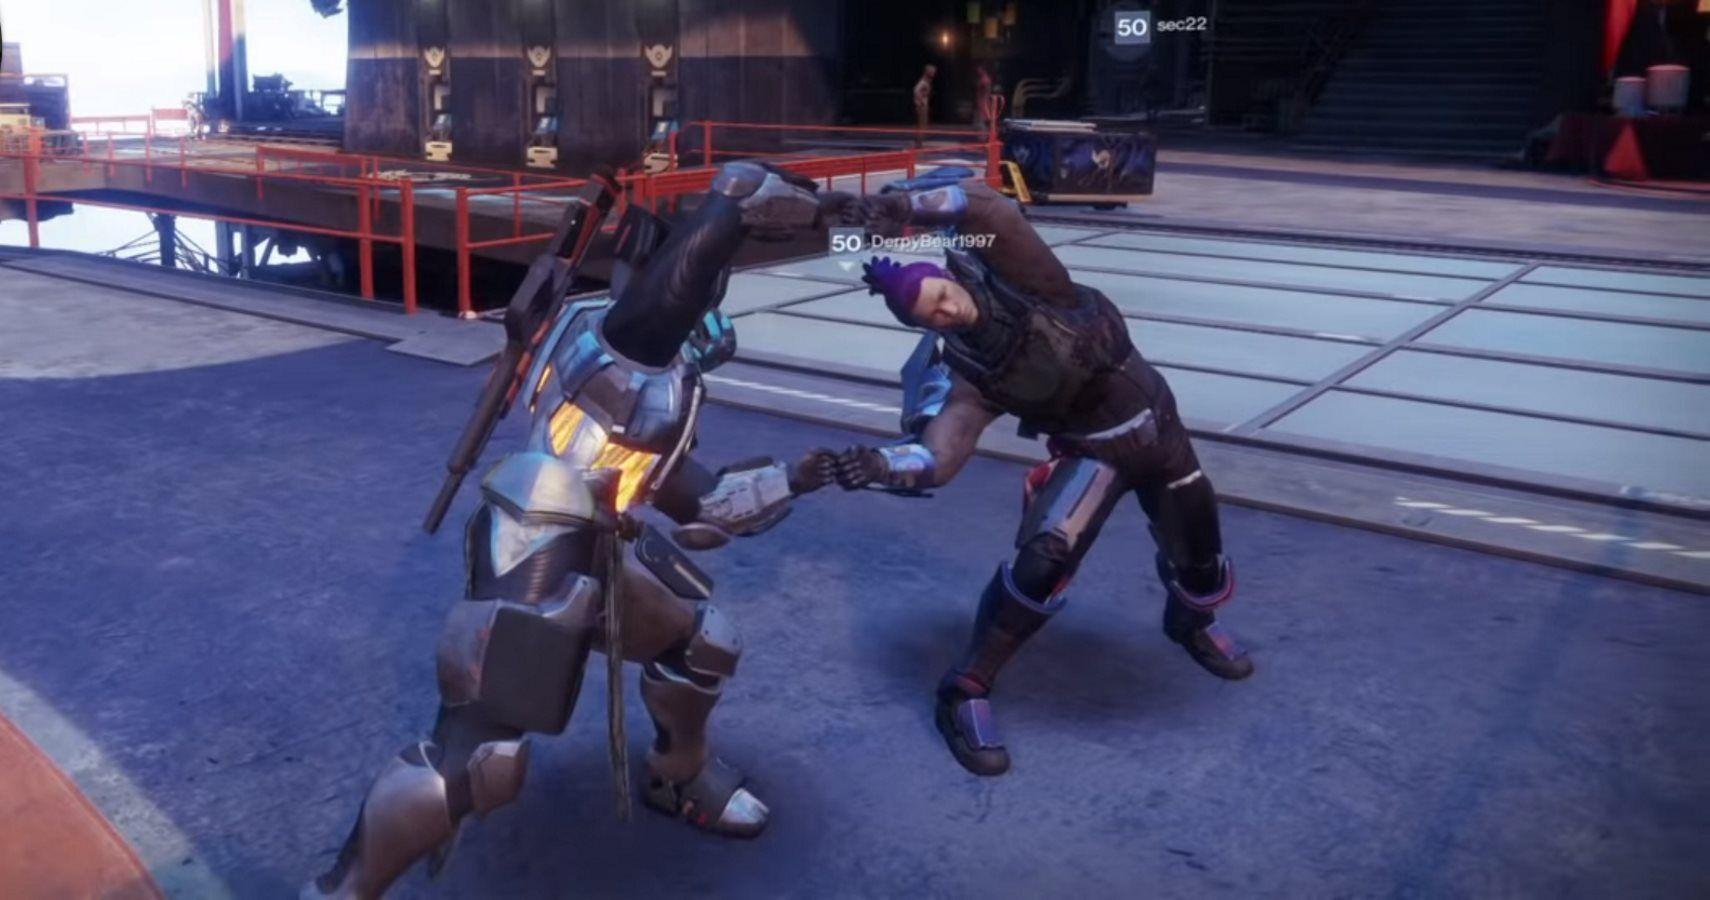 Destiny Dance Gif: Destiny 2 Meets Dragon Ball Z With New Fusion Emote